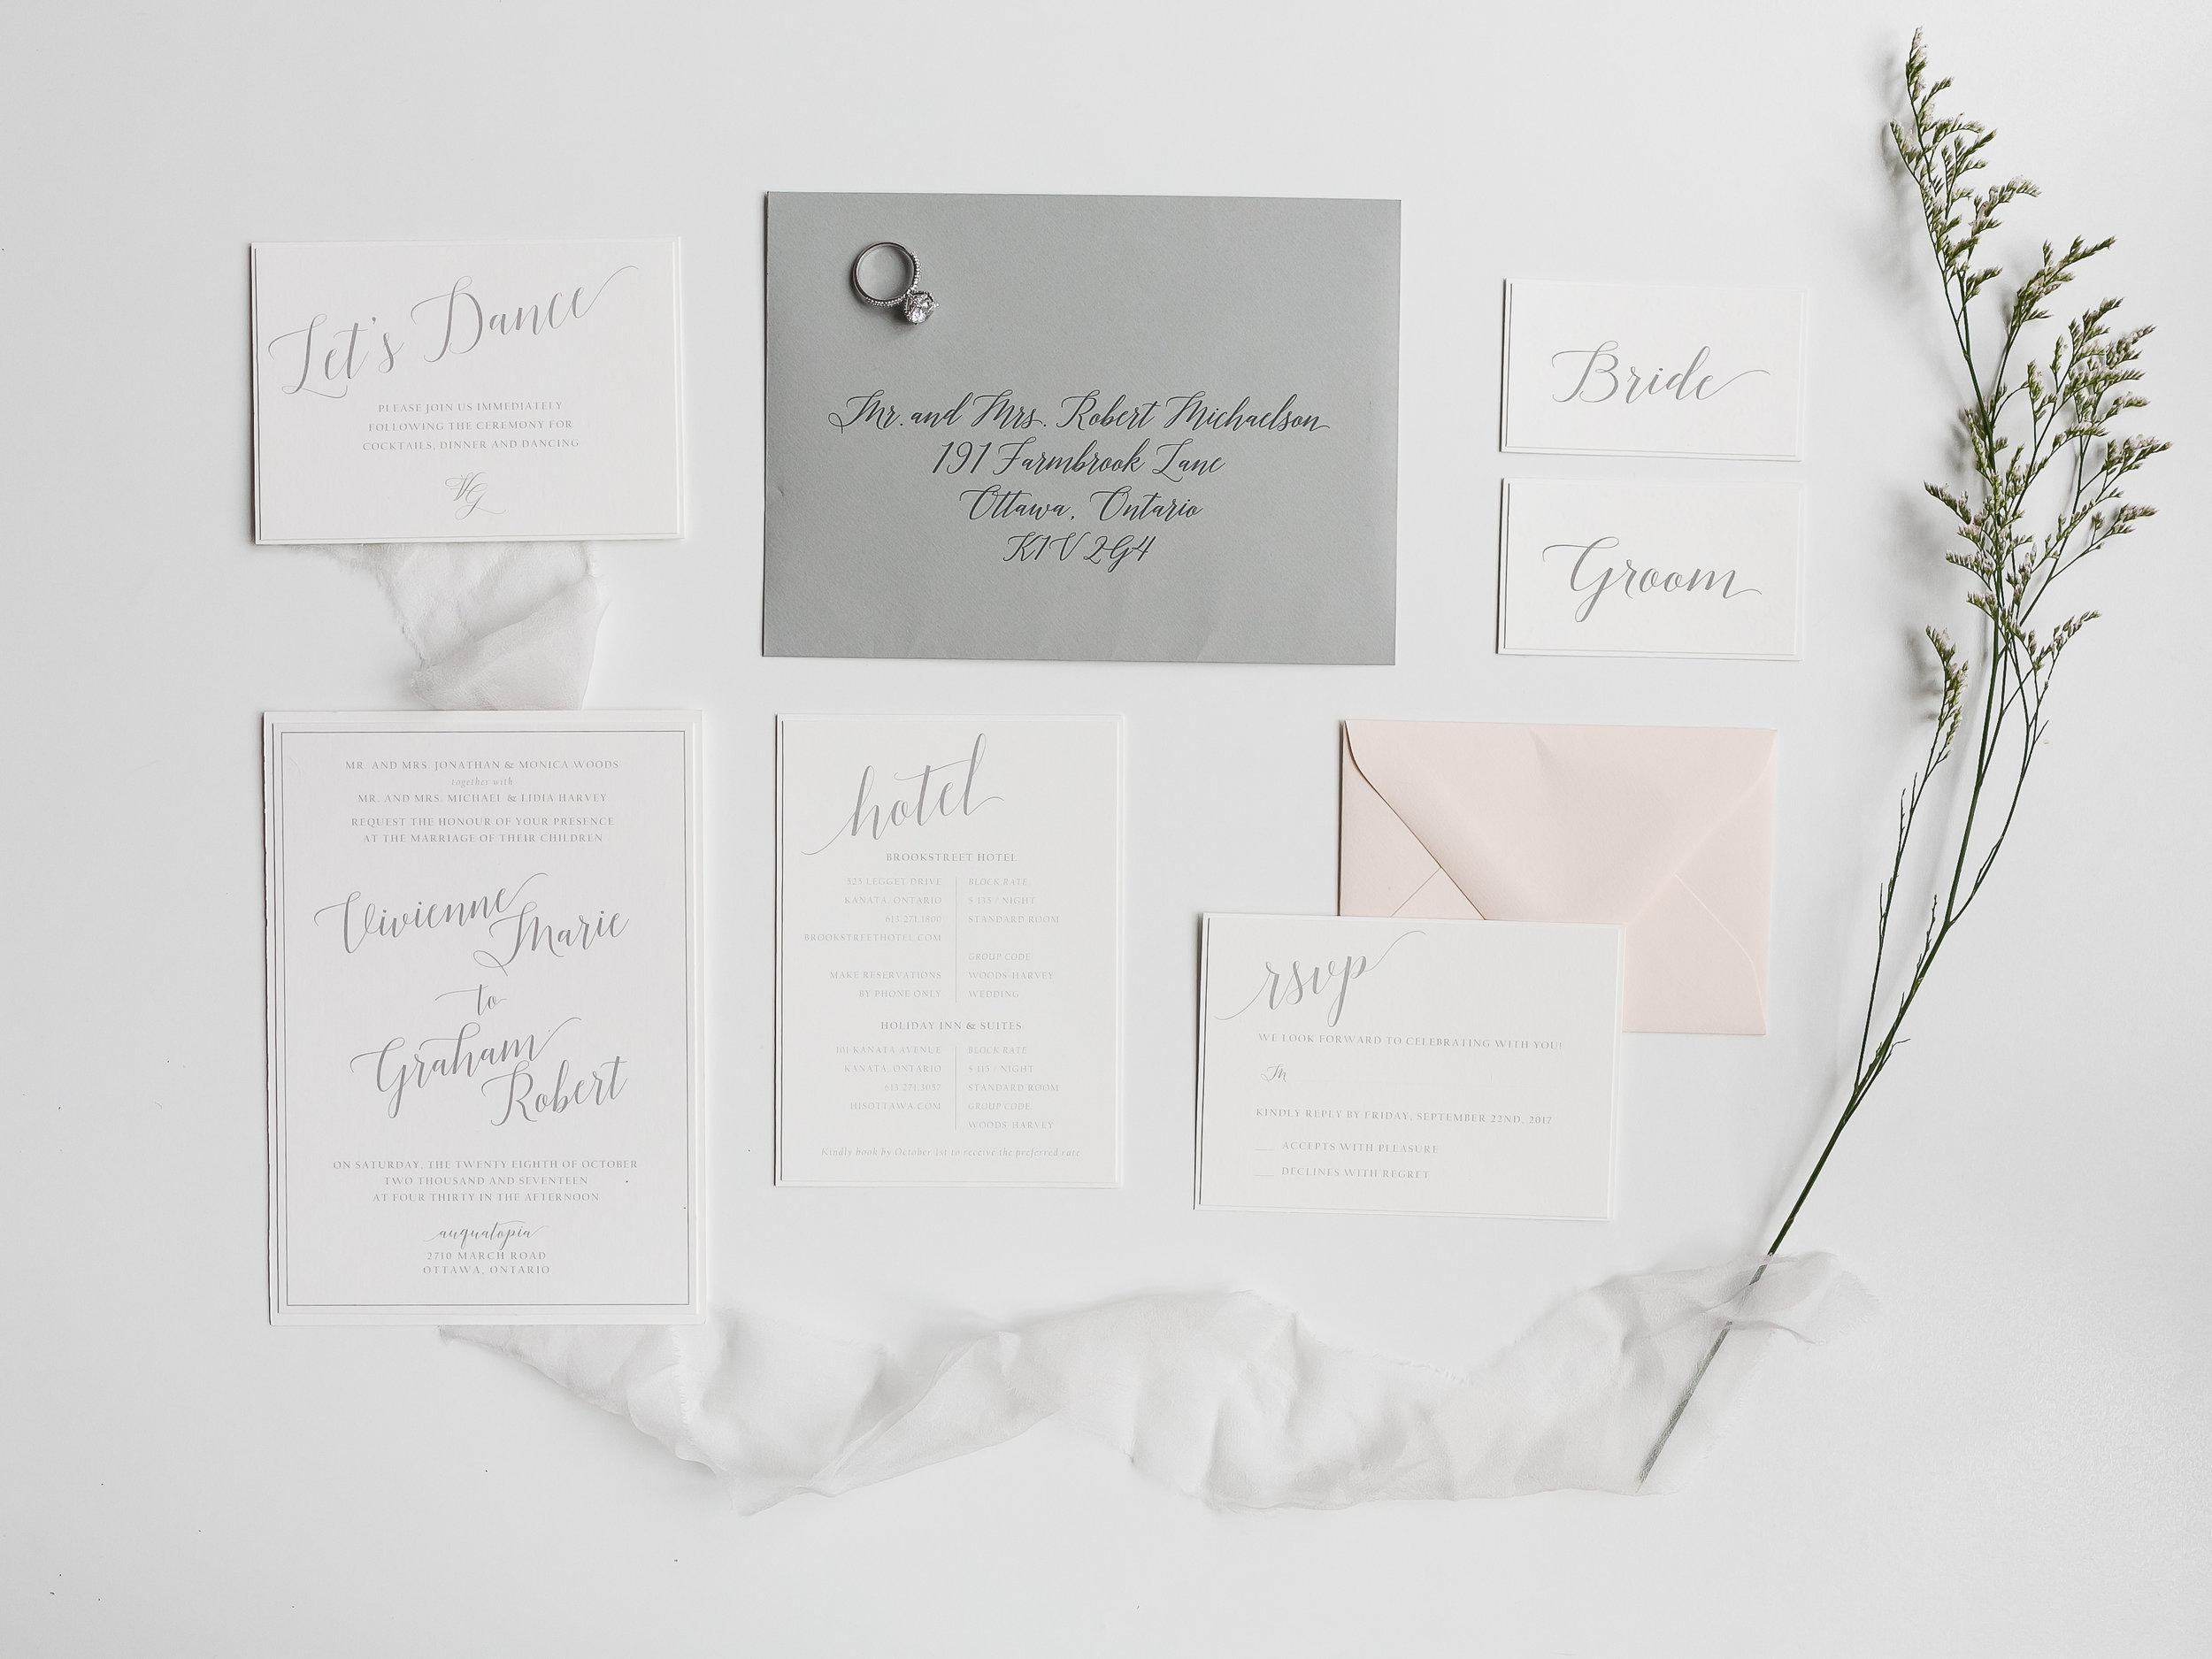 Aquatopia-Wedding-Ottawa-Wedding-Photographer-Stephanie-Mason-Photography-12.jpg